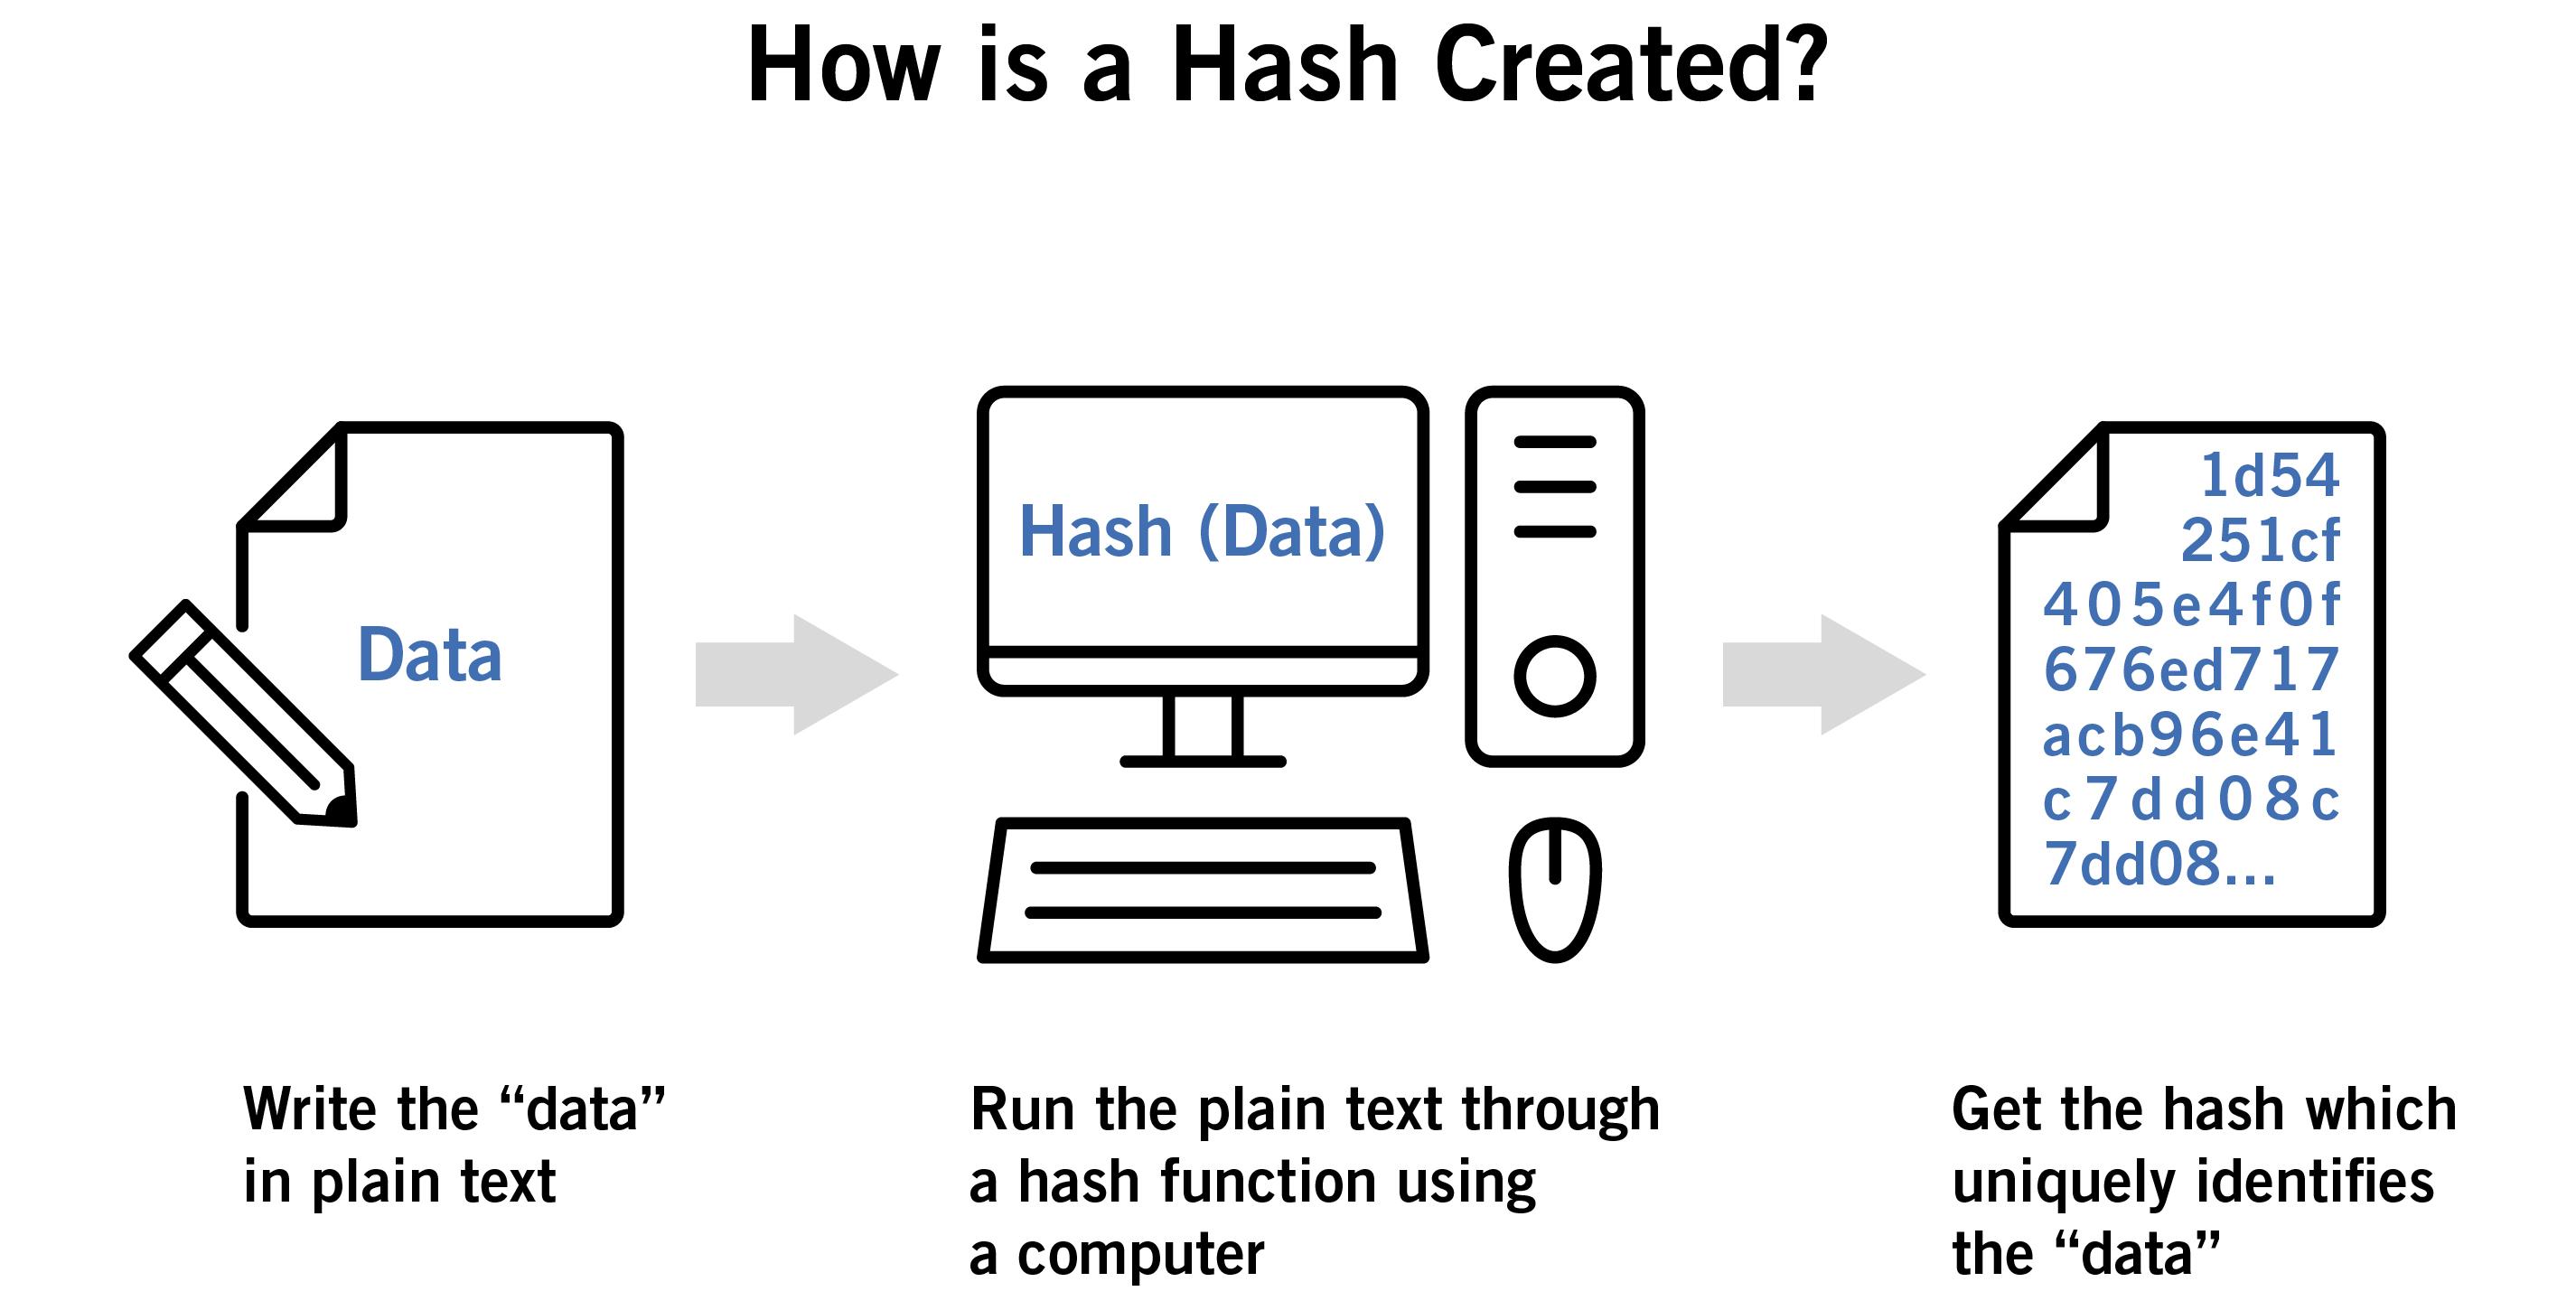 Blockchain Hash Creation